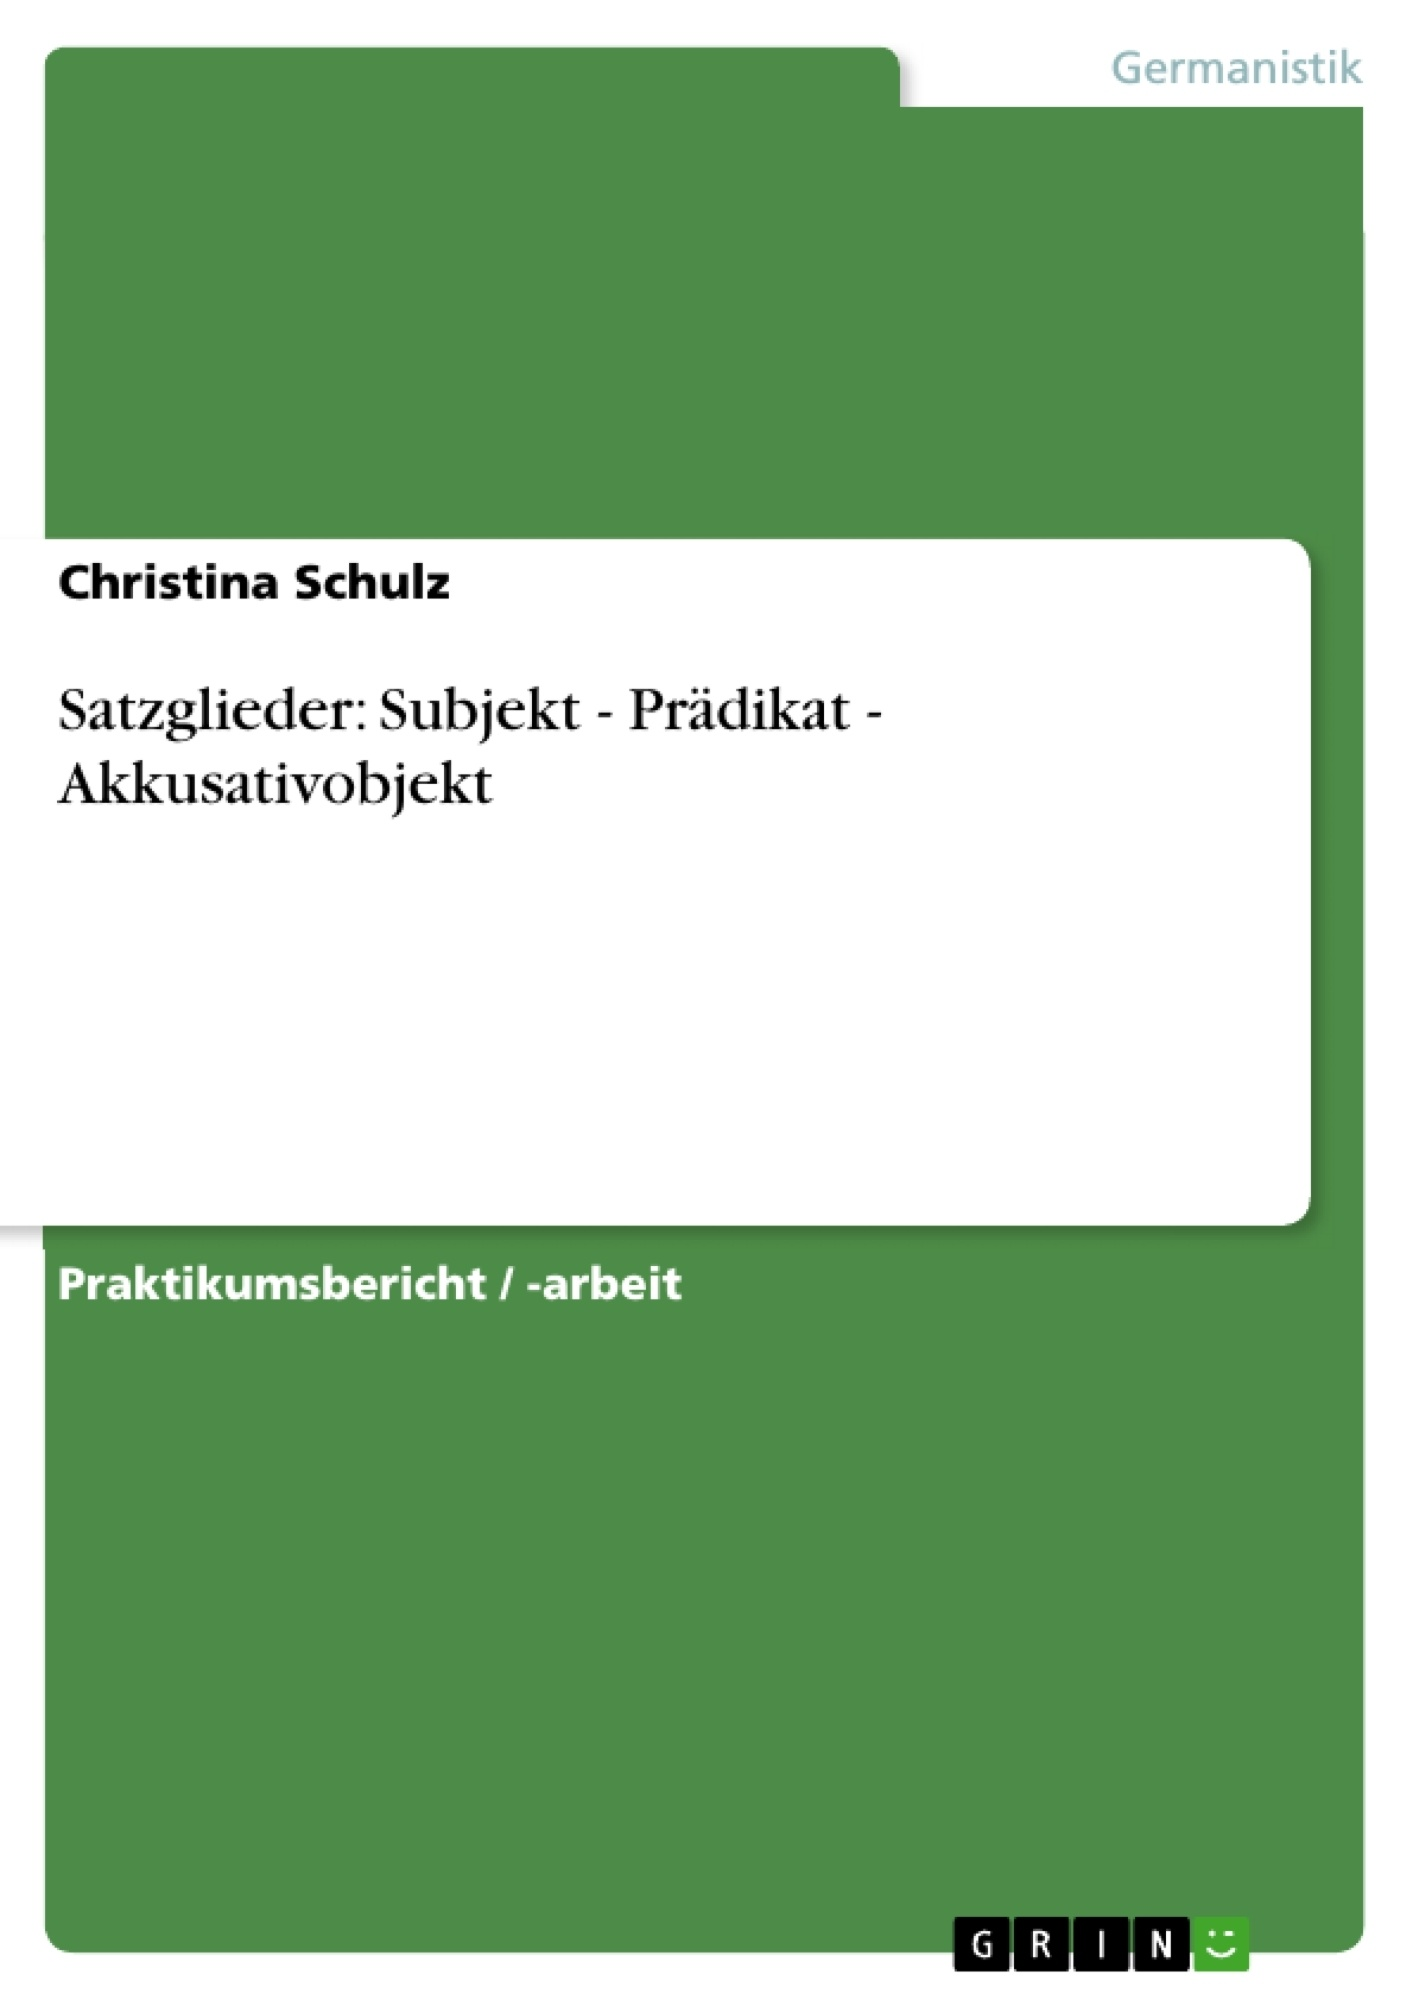 Satzglieder: Subjekt - Prädikat - Akkusativobjekt | Masterarbeit ...